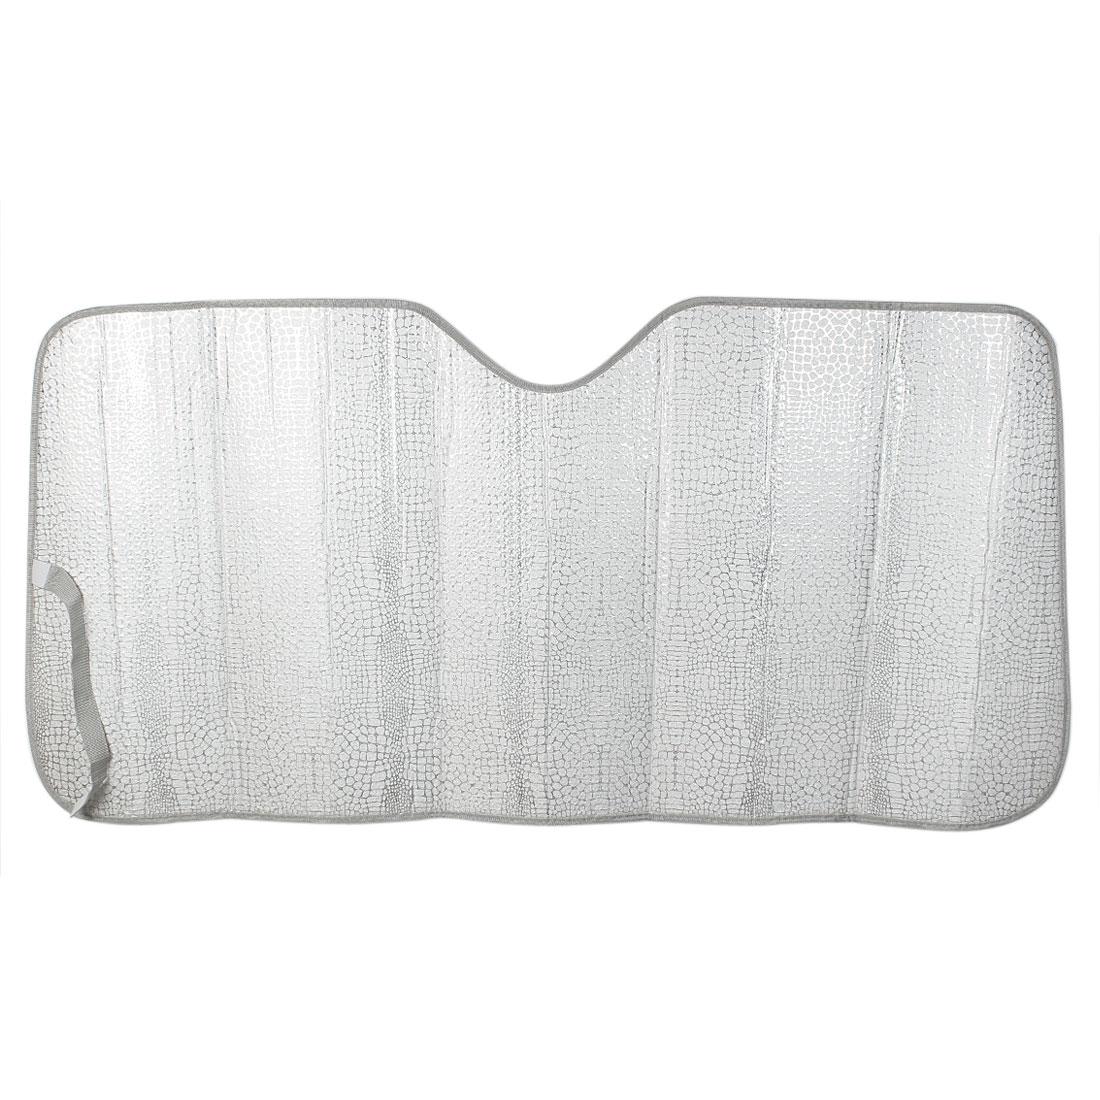 Sliver Tone Aluminum Foil Heat Resistant Car Windshield Window Sunshade